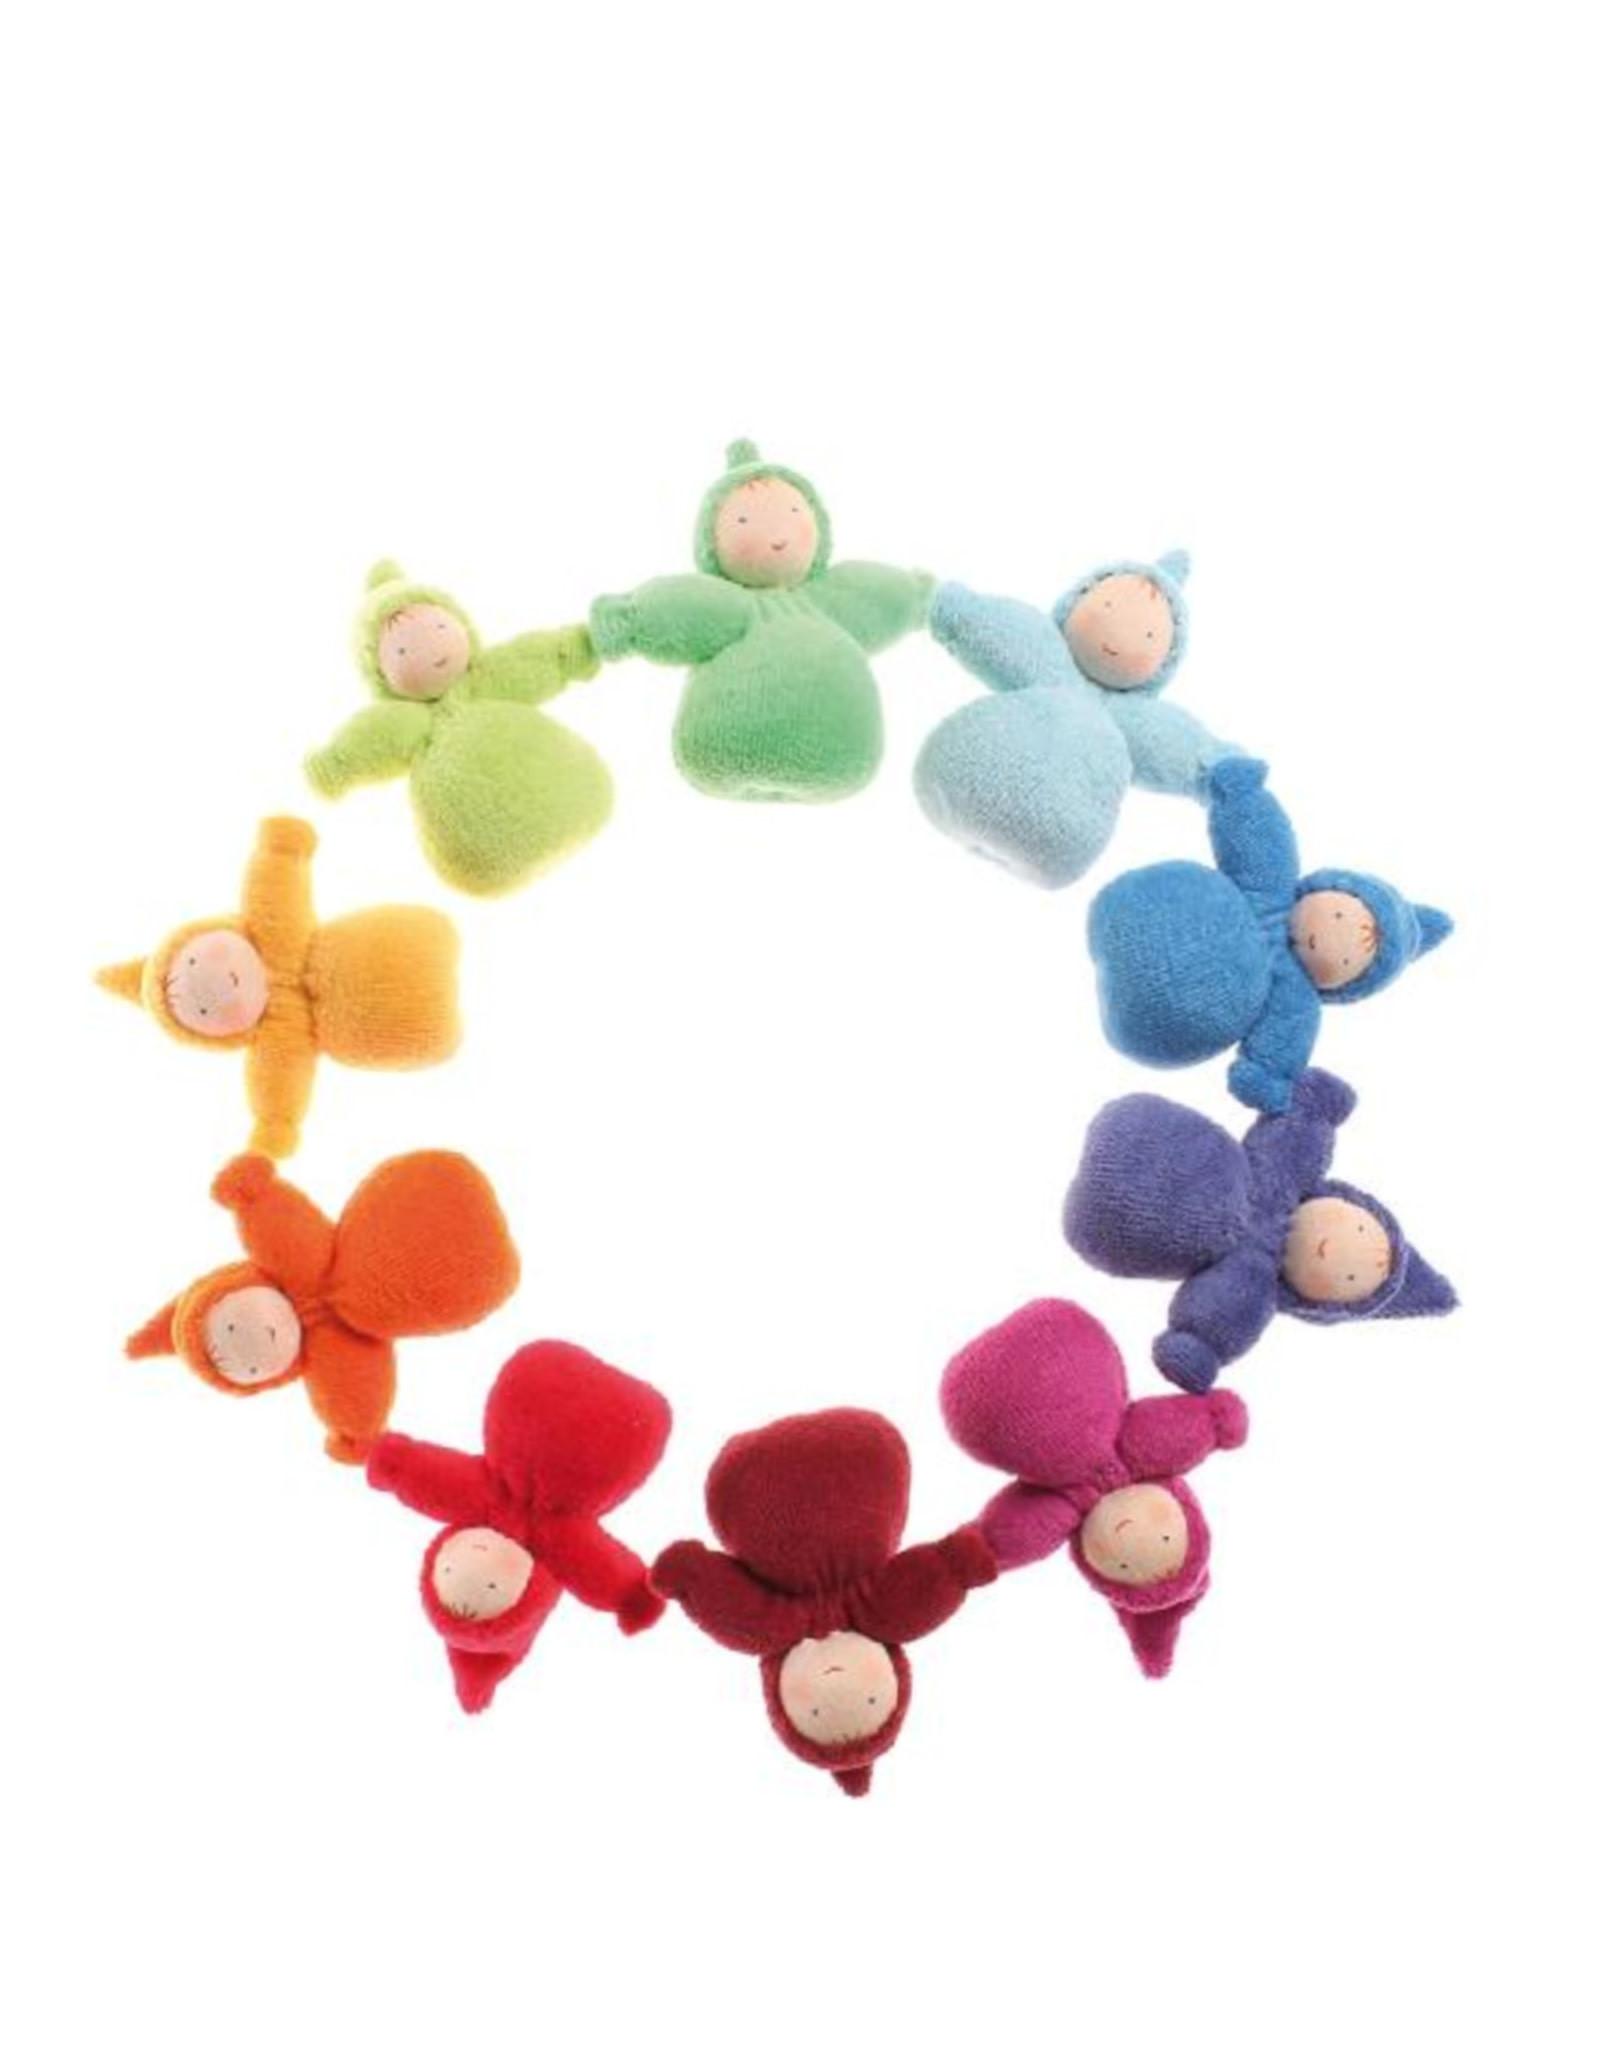 Grimm's 10 Petits lutins Waldorf multicolores